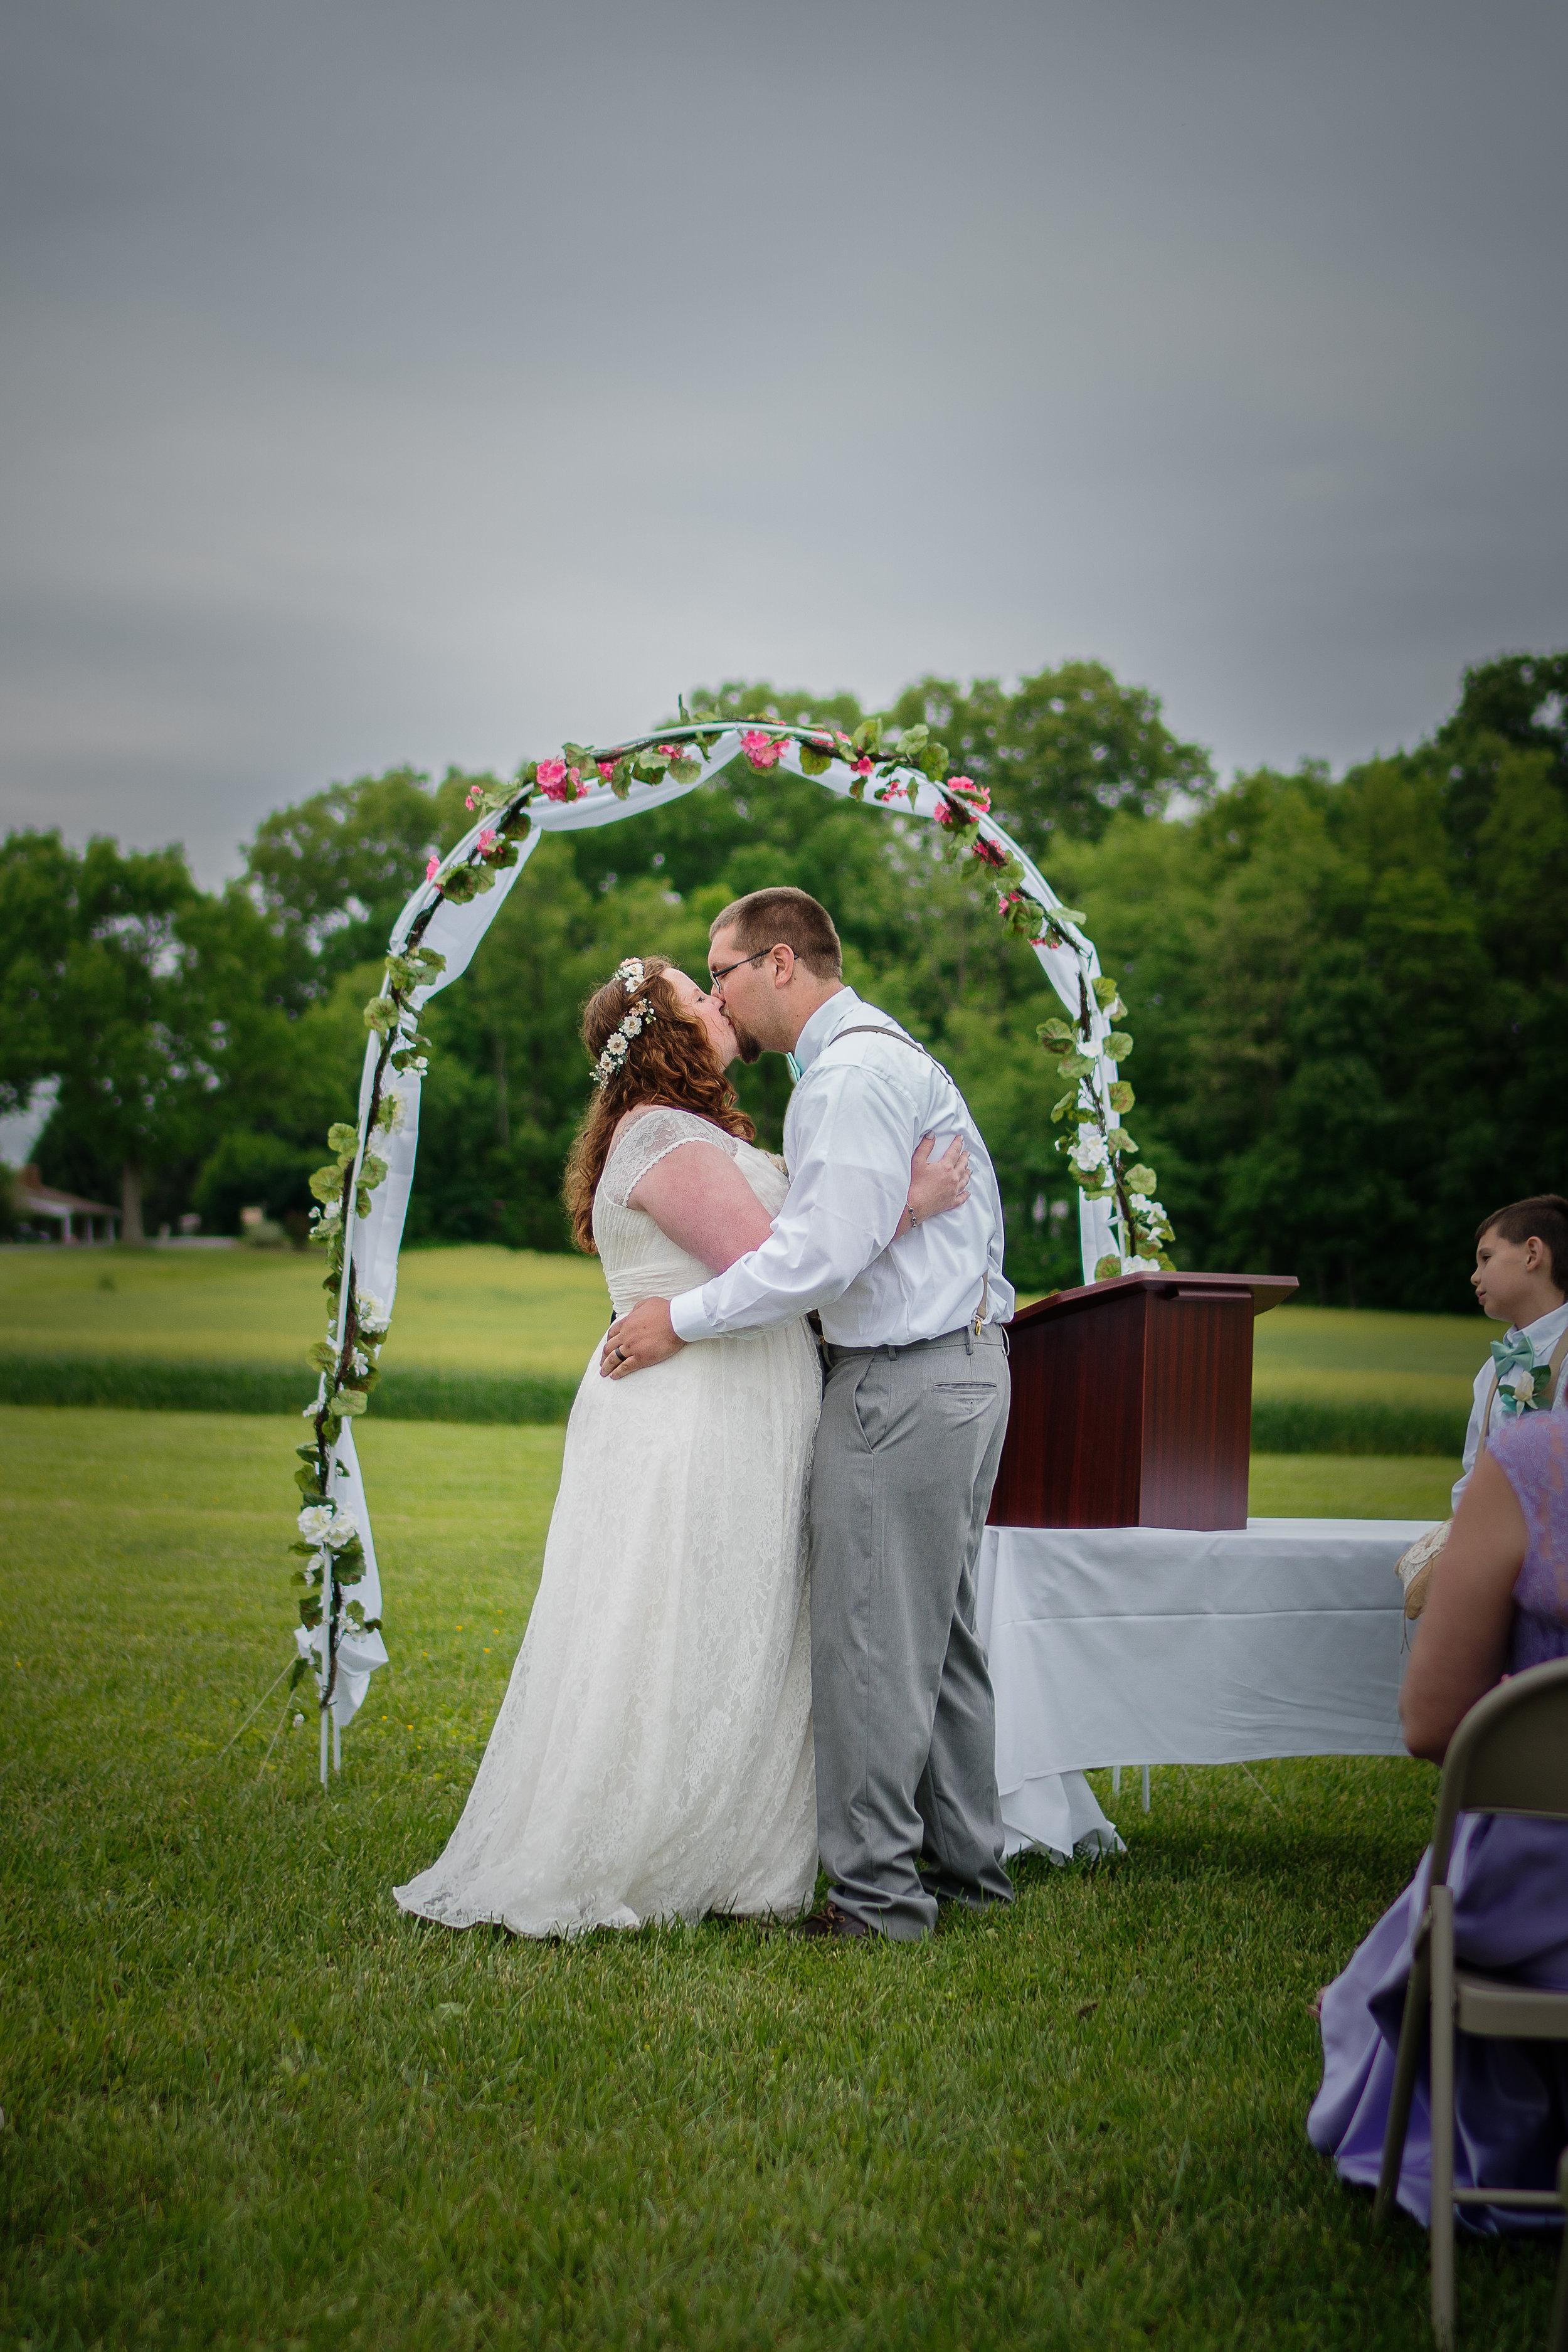 wedding first kiss photo